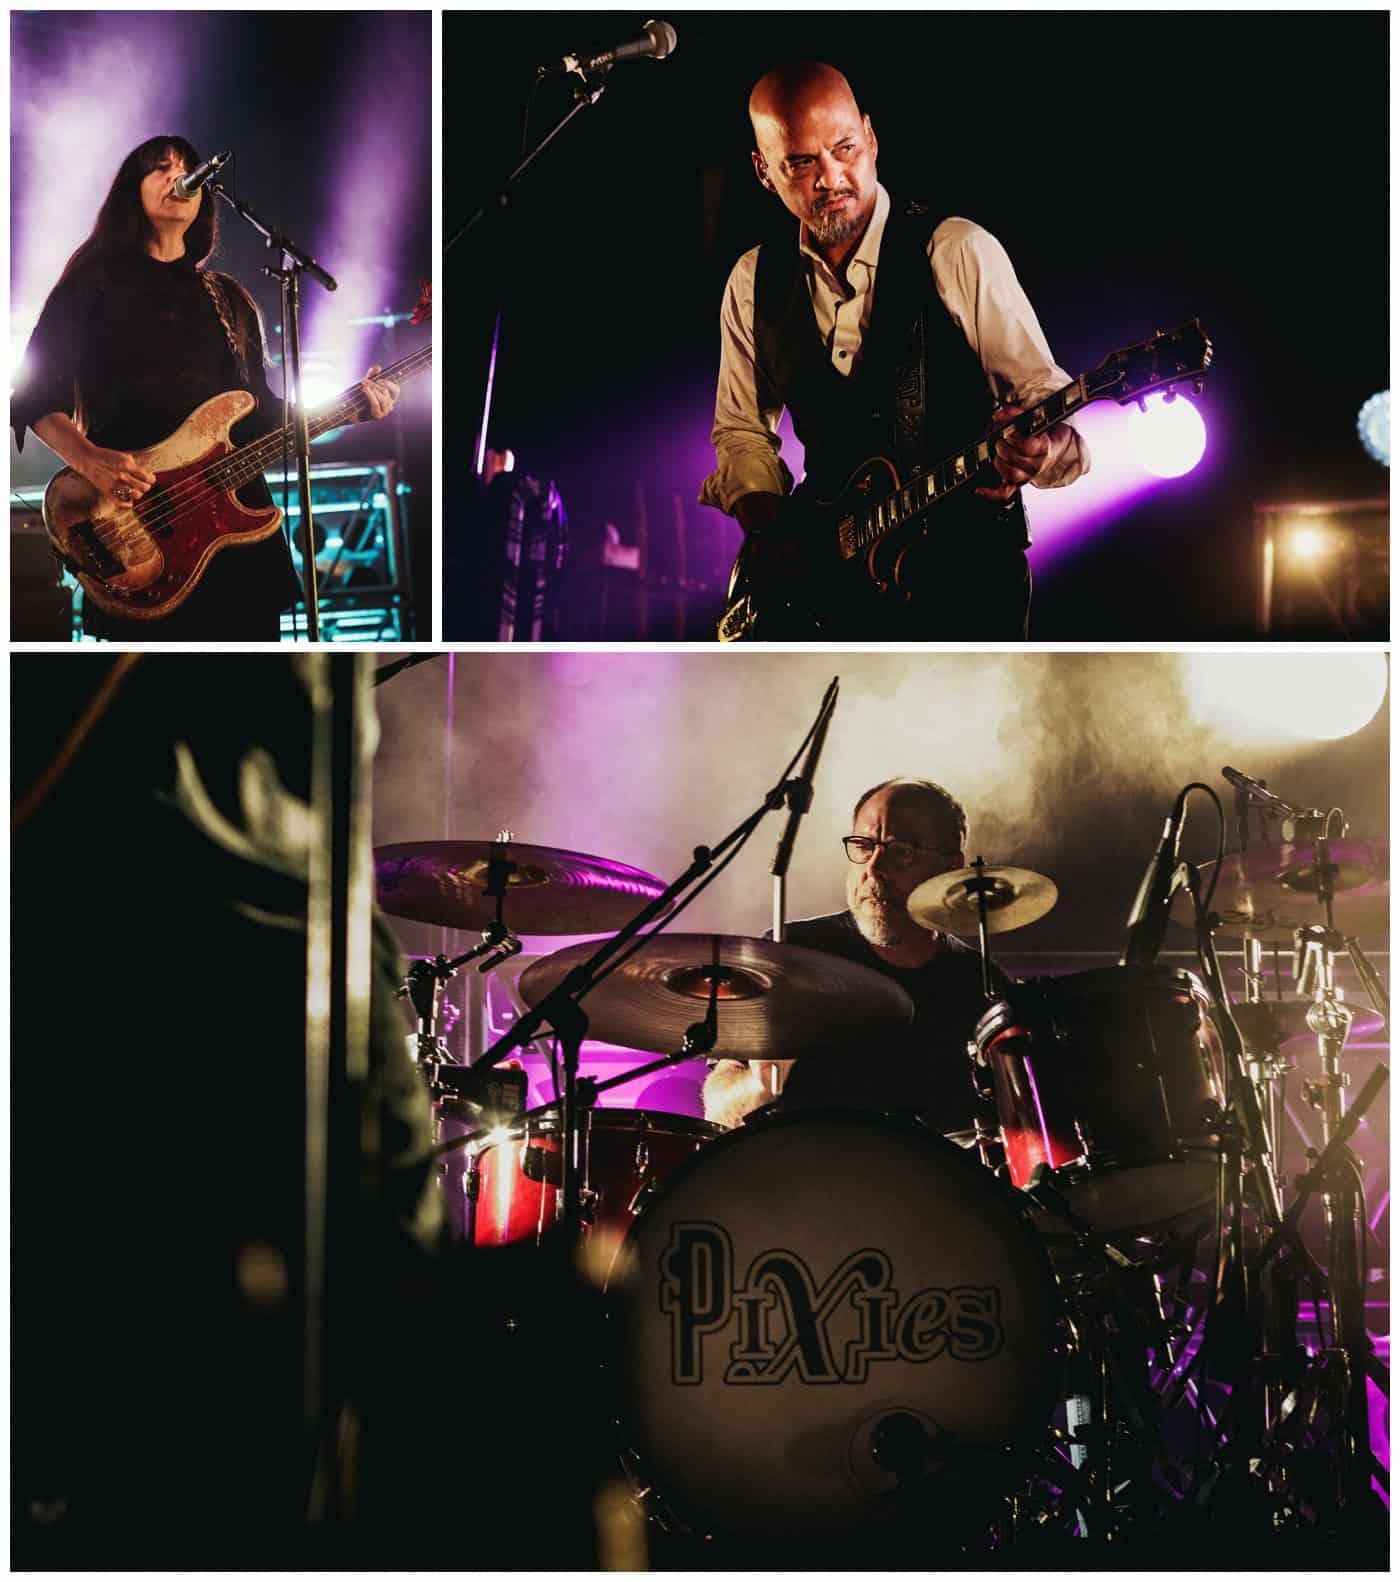 pixies montreal mtelus photos